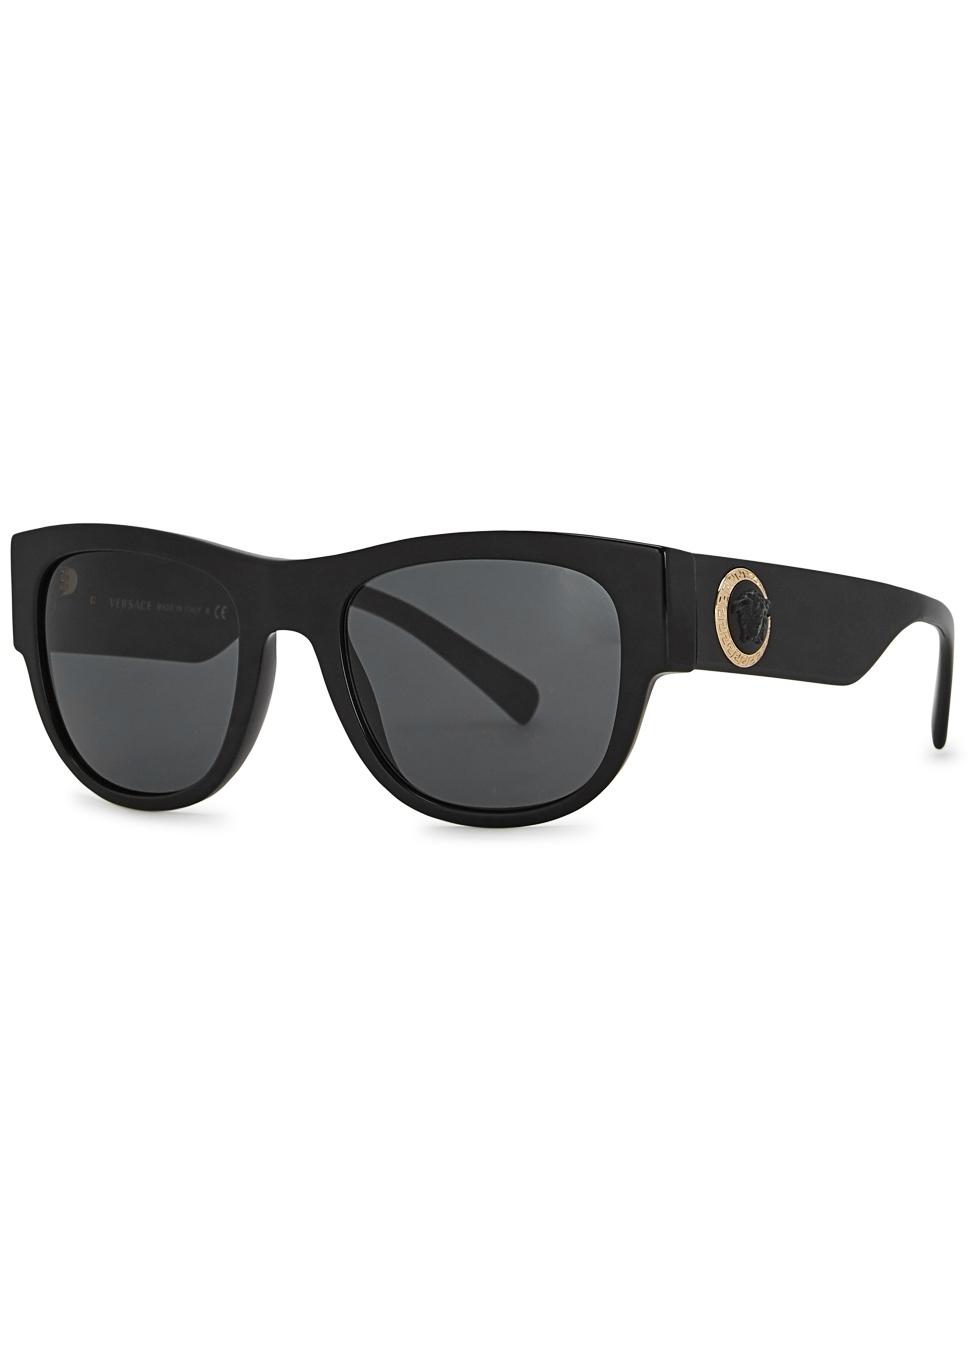 fa5629f9214 Women s Designer Sunglasses and Eyewear - Harvey Nichols